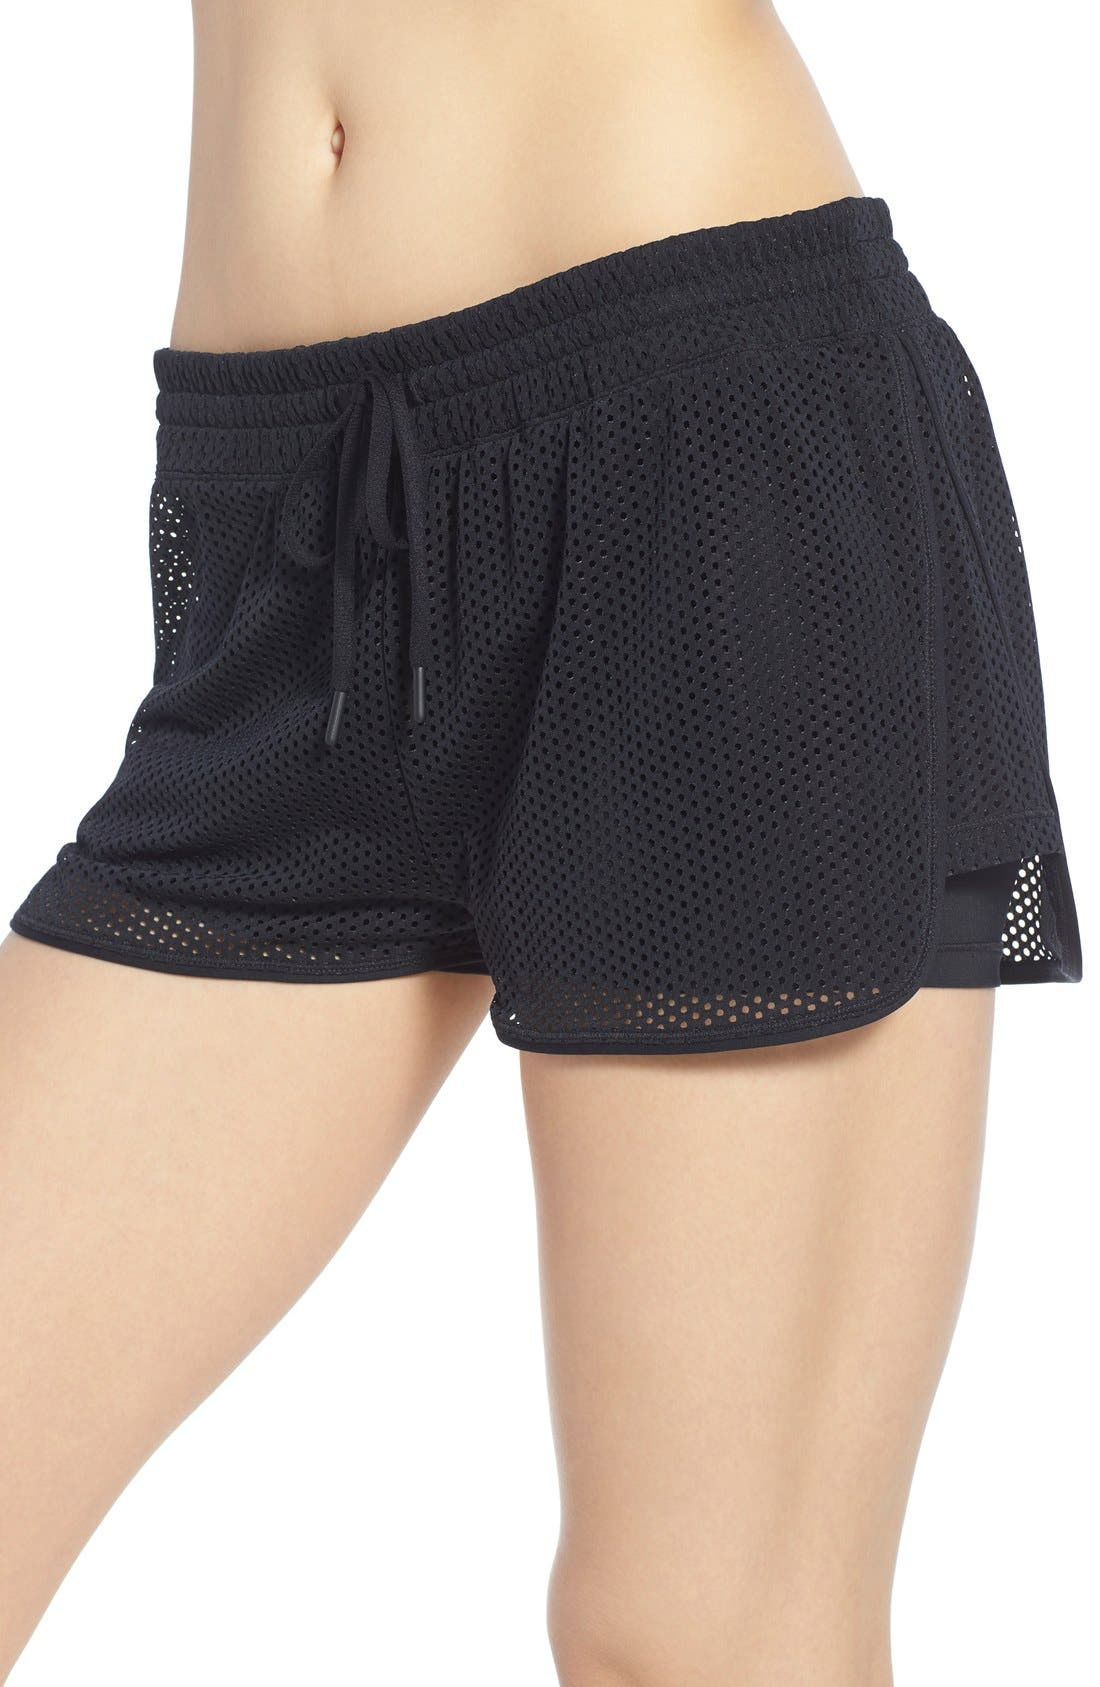 Mesh Running Shorts,                             Alternate thumbnail 5, color,                             001